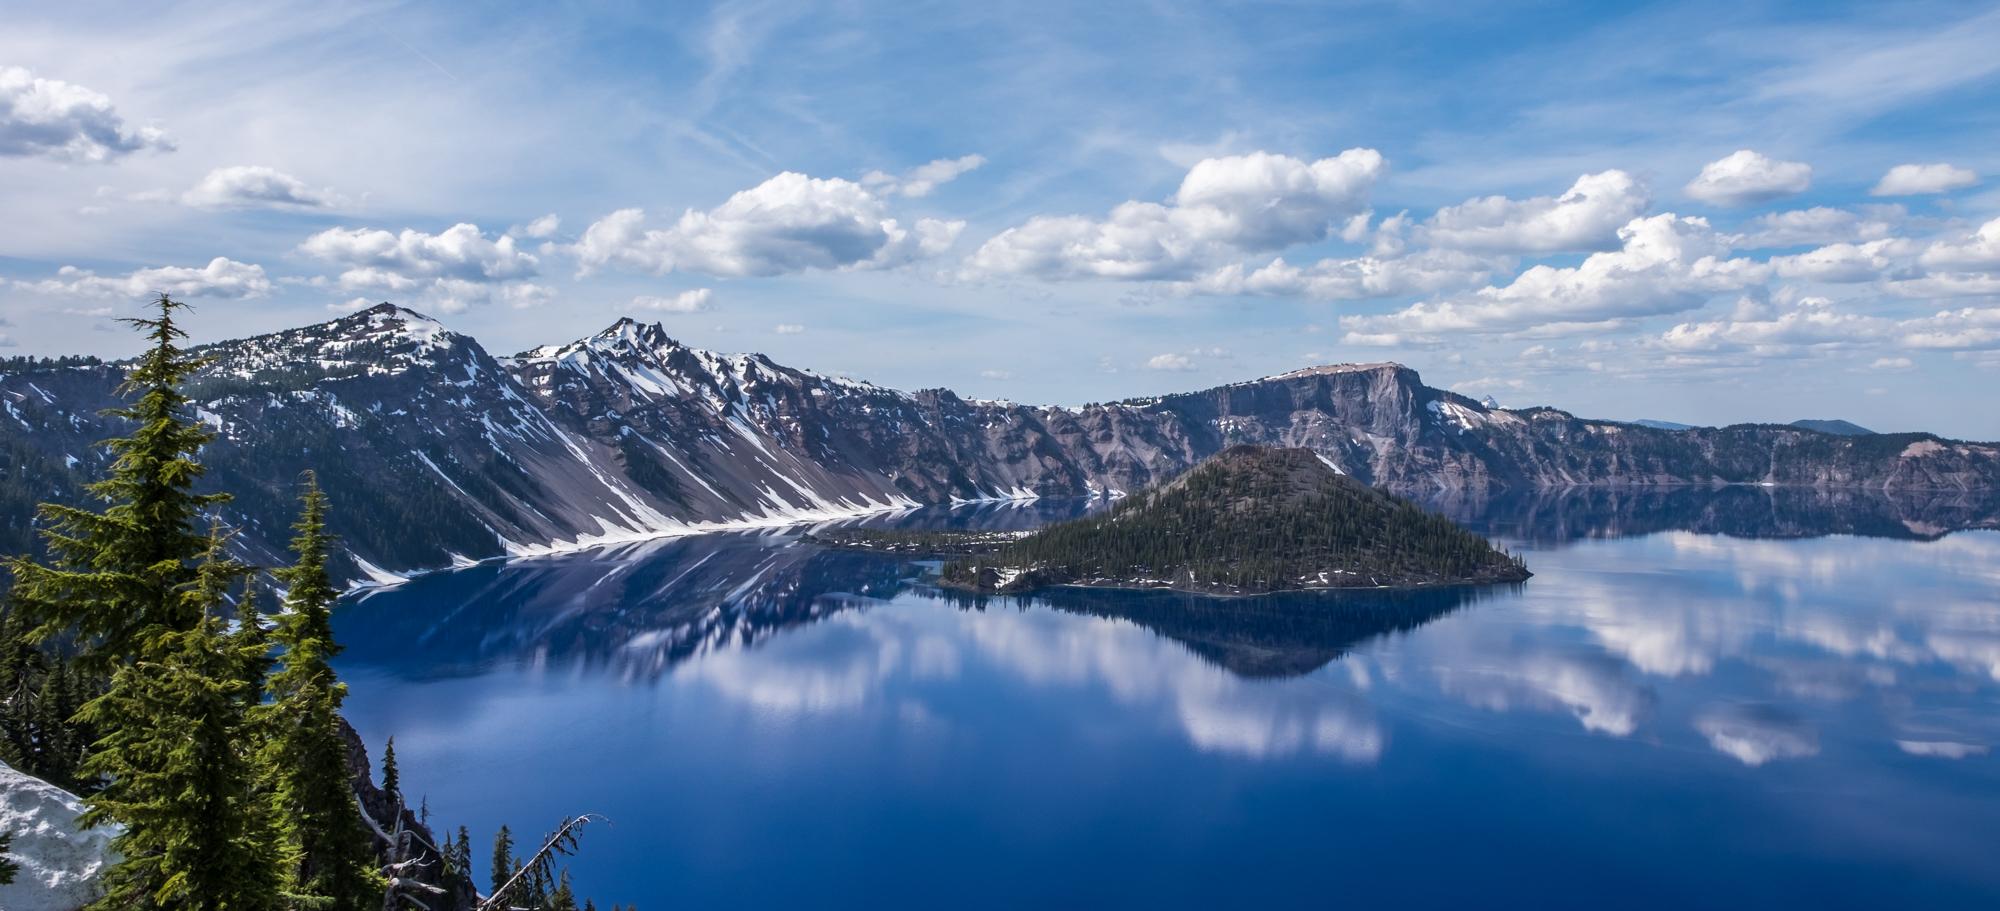 Crater Lake National Park - 014.jpg